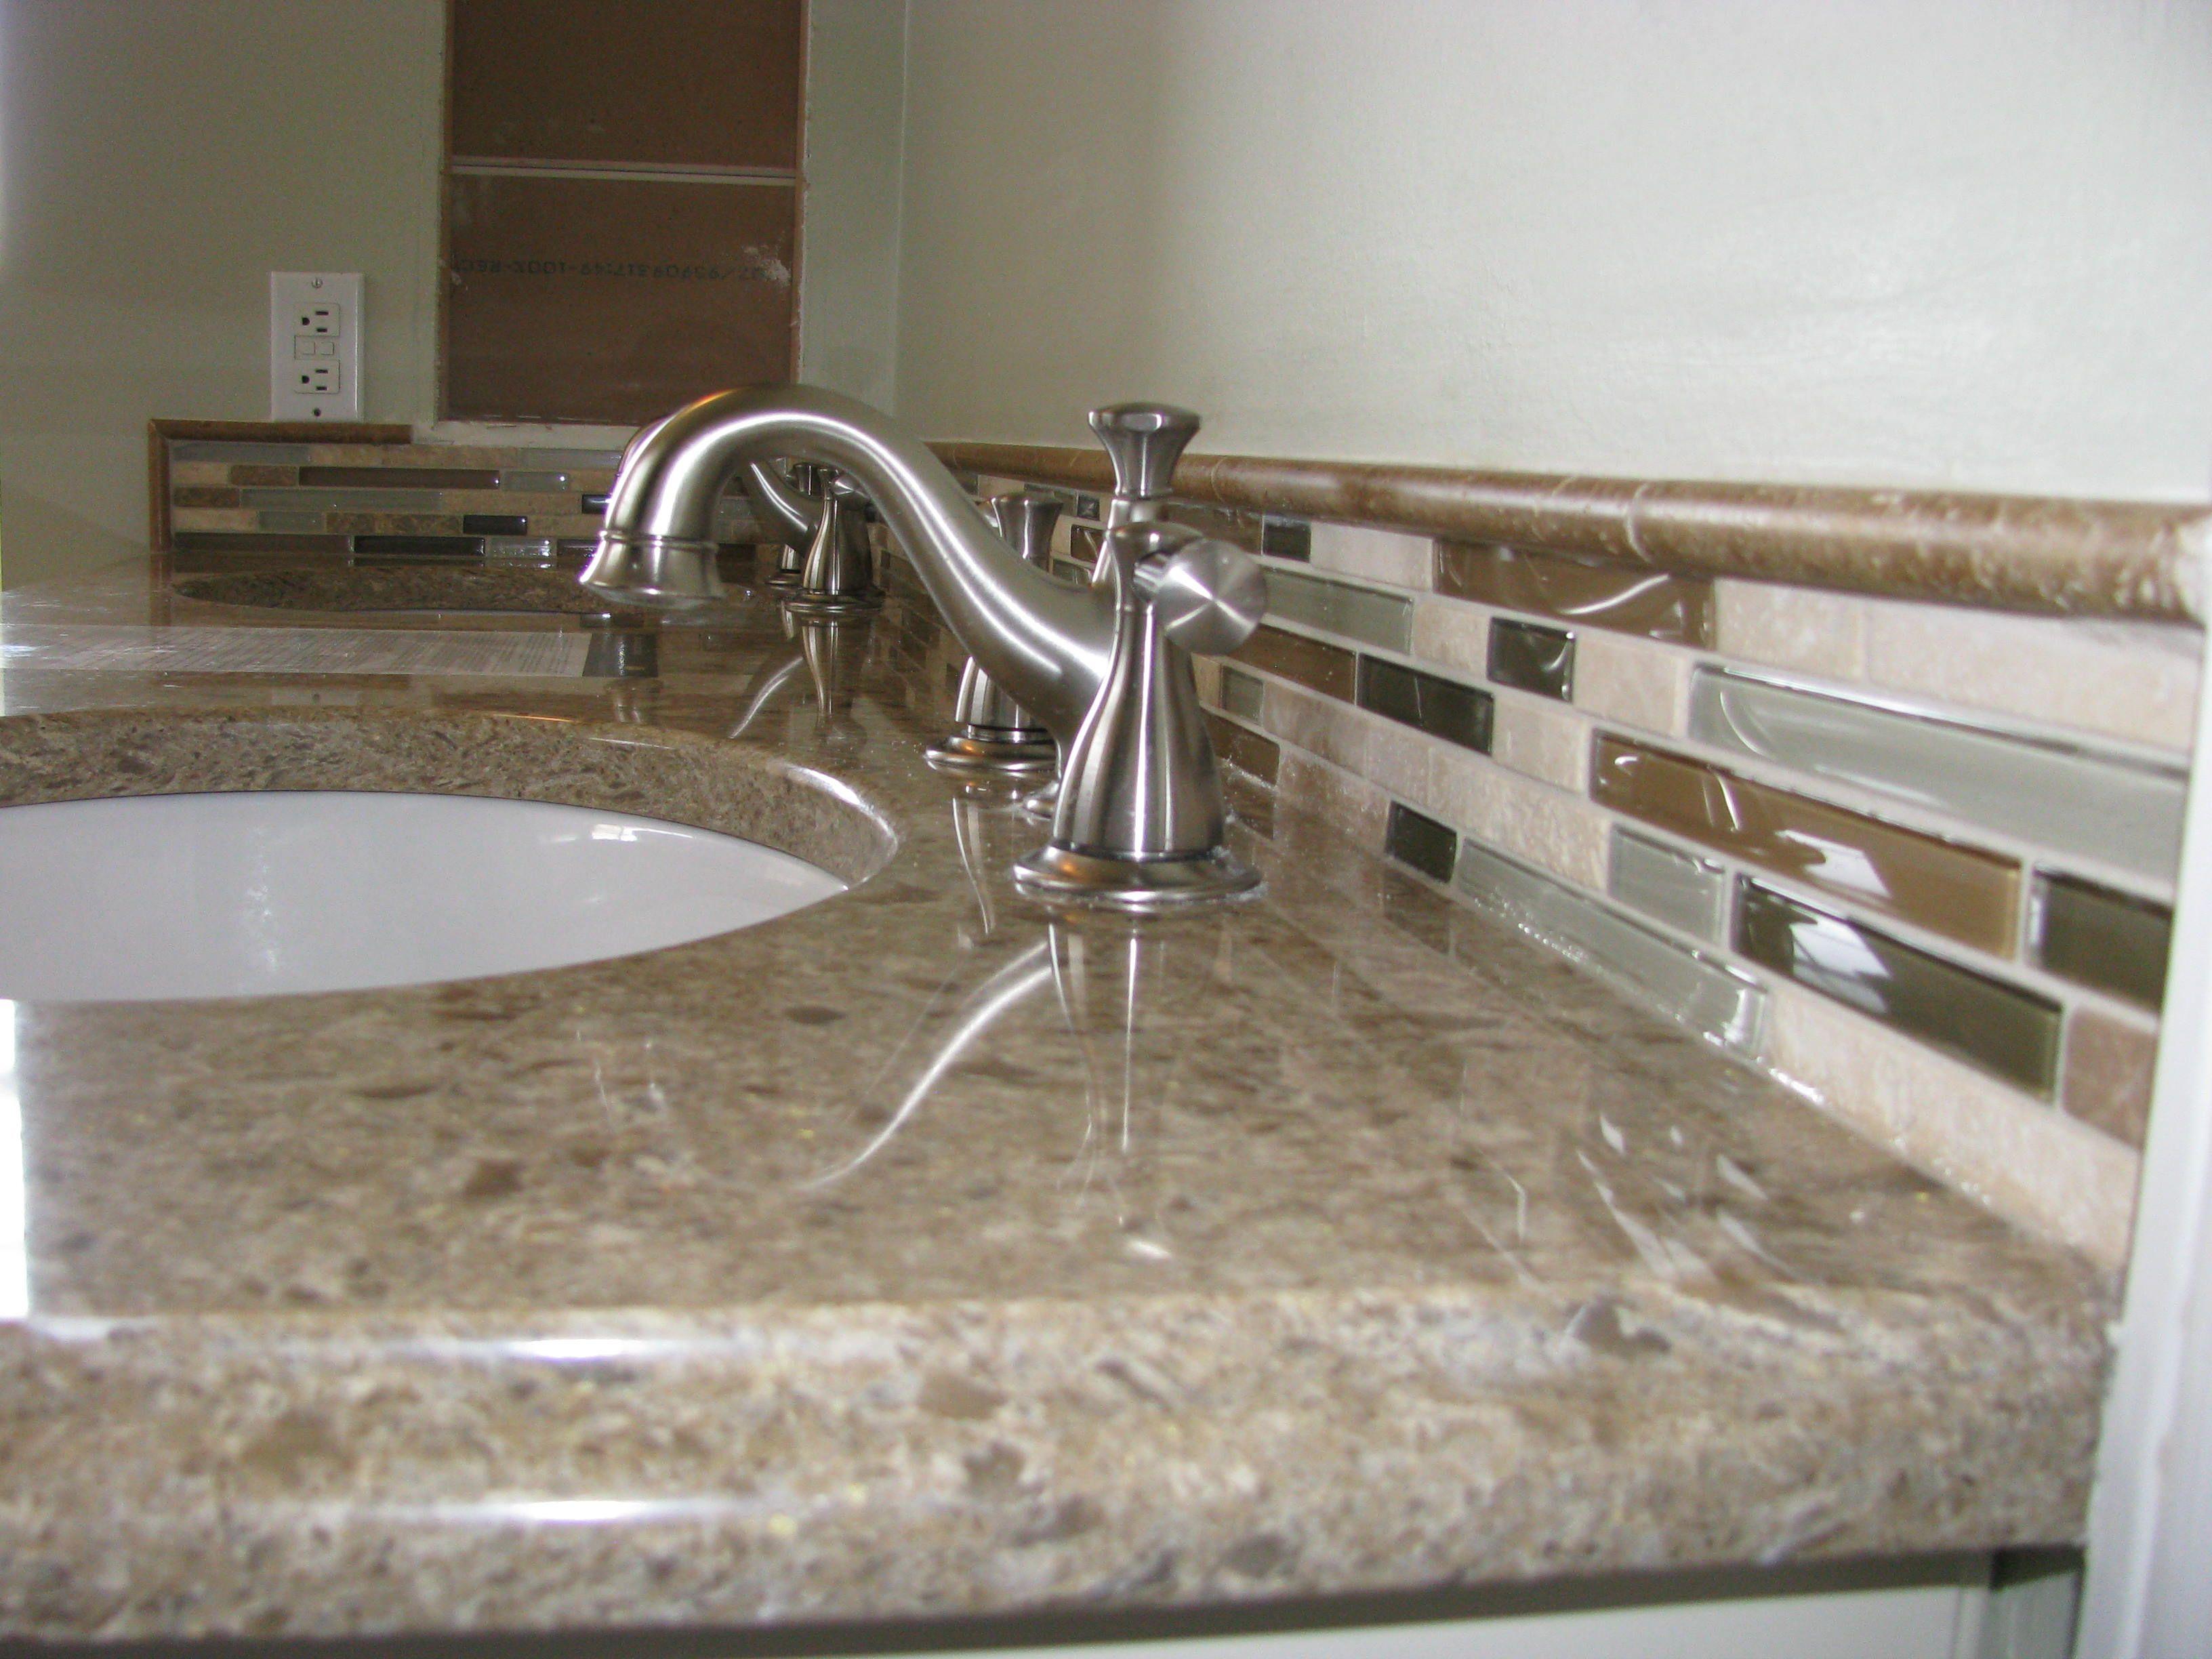 backsplash bathroom ideas. Bathroom Decorations ~ Fancy Backsplash Texture And Color Inspiring Ideas: Stylish Single Sink Stainless Harlon Low Arc Faucet On Gray Ideas S